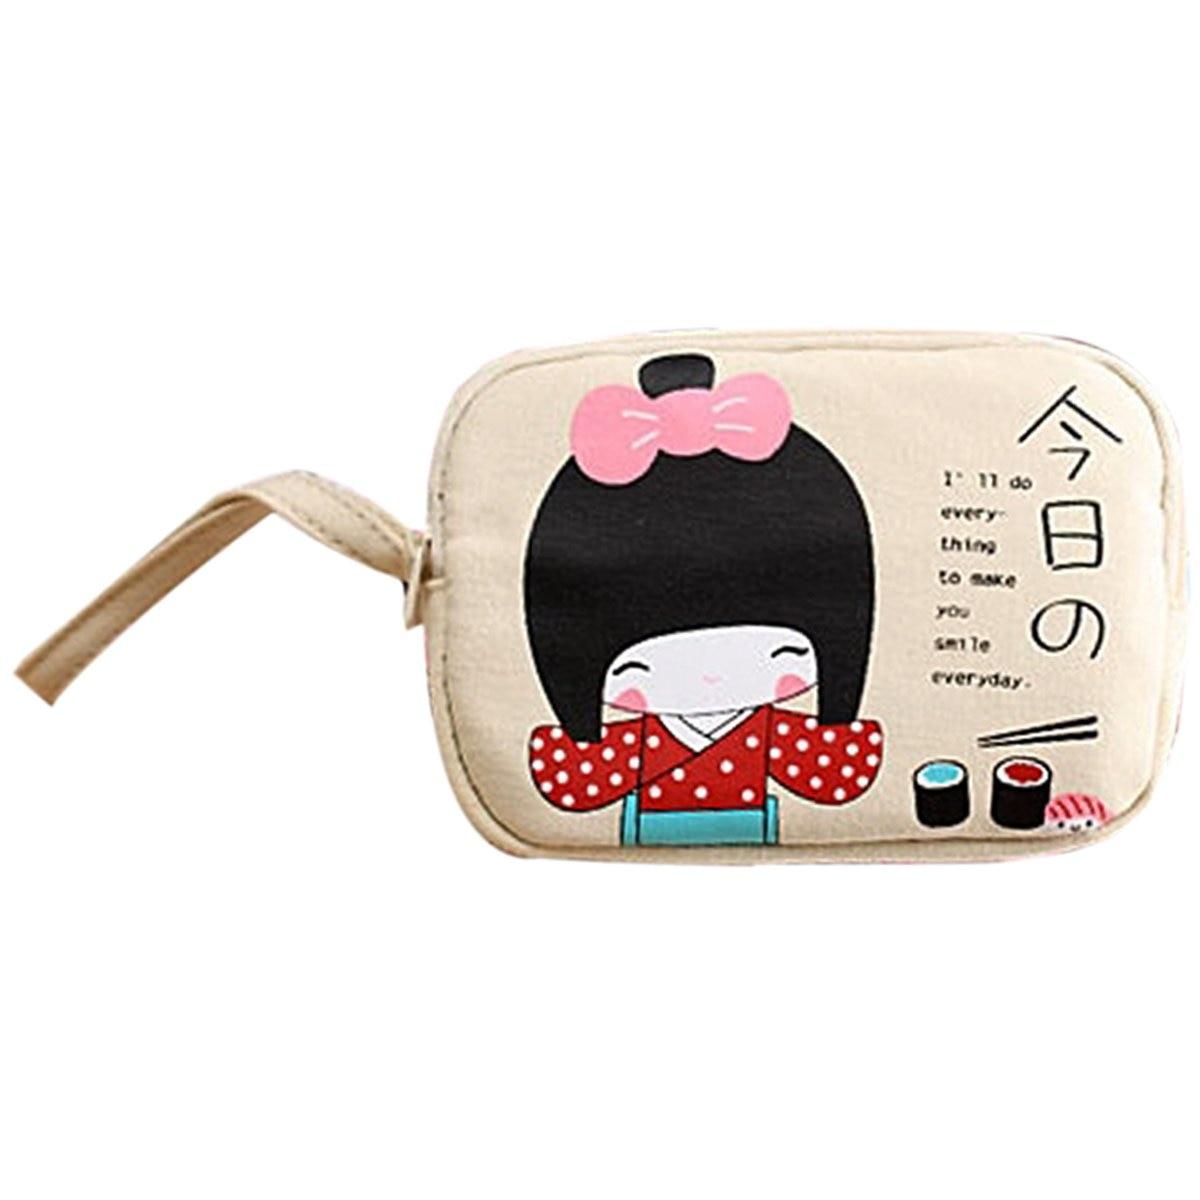 VSEN Wholesale Cute Japanese Girl Print Canvas Phone Bag Double Zipper Purse Coin Bag Off-White